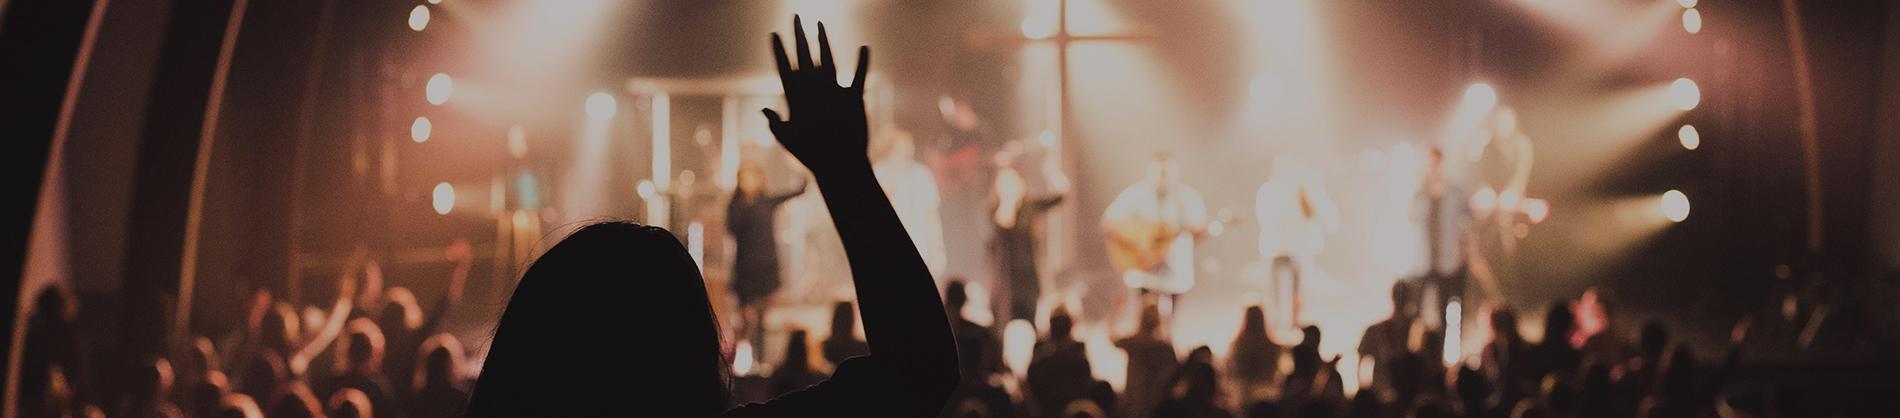 Worship band leading worship